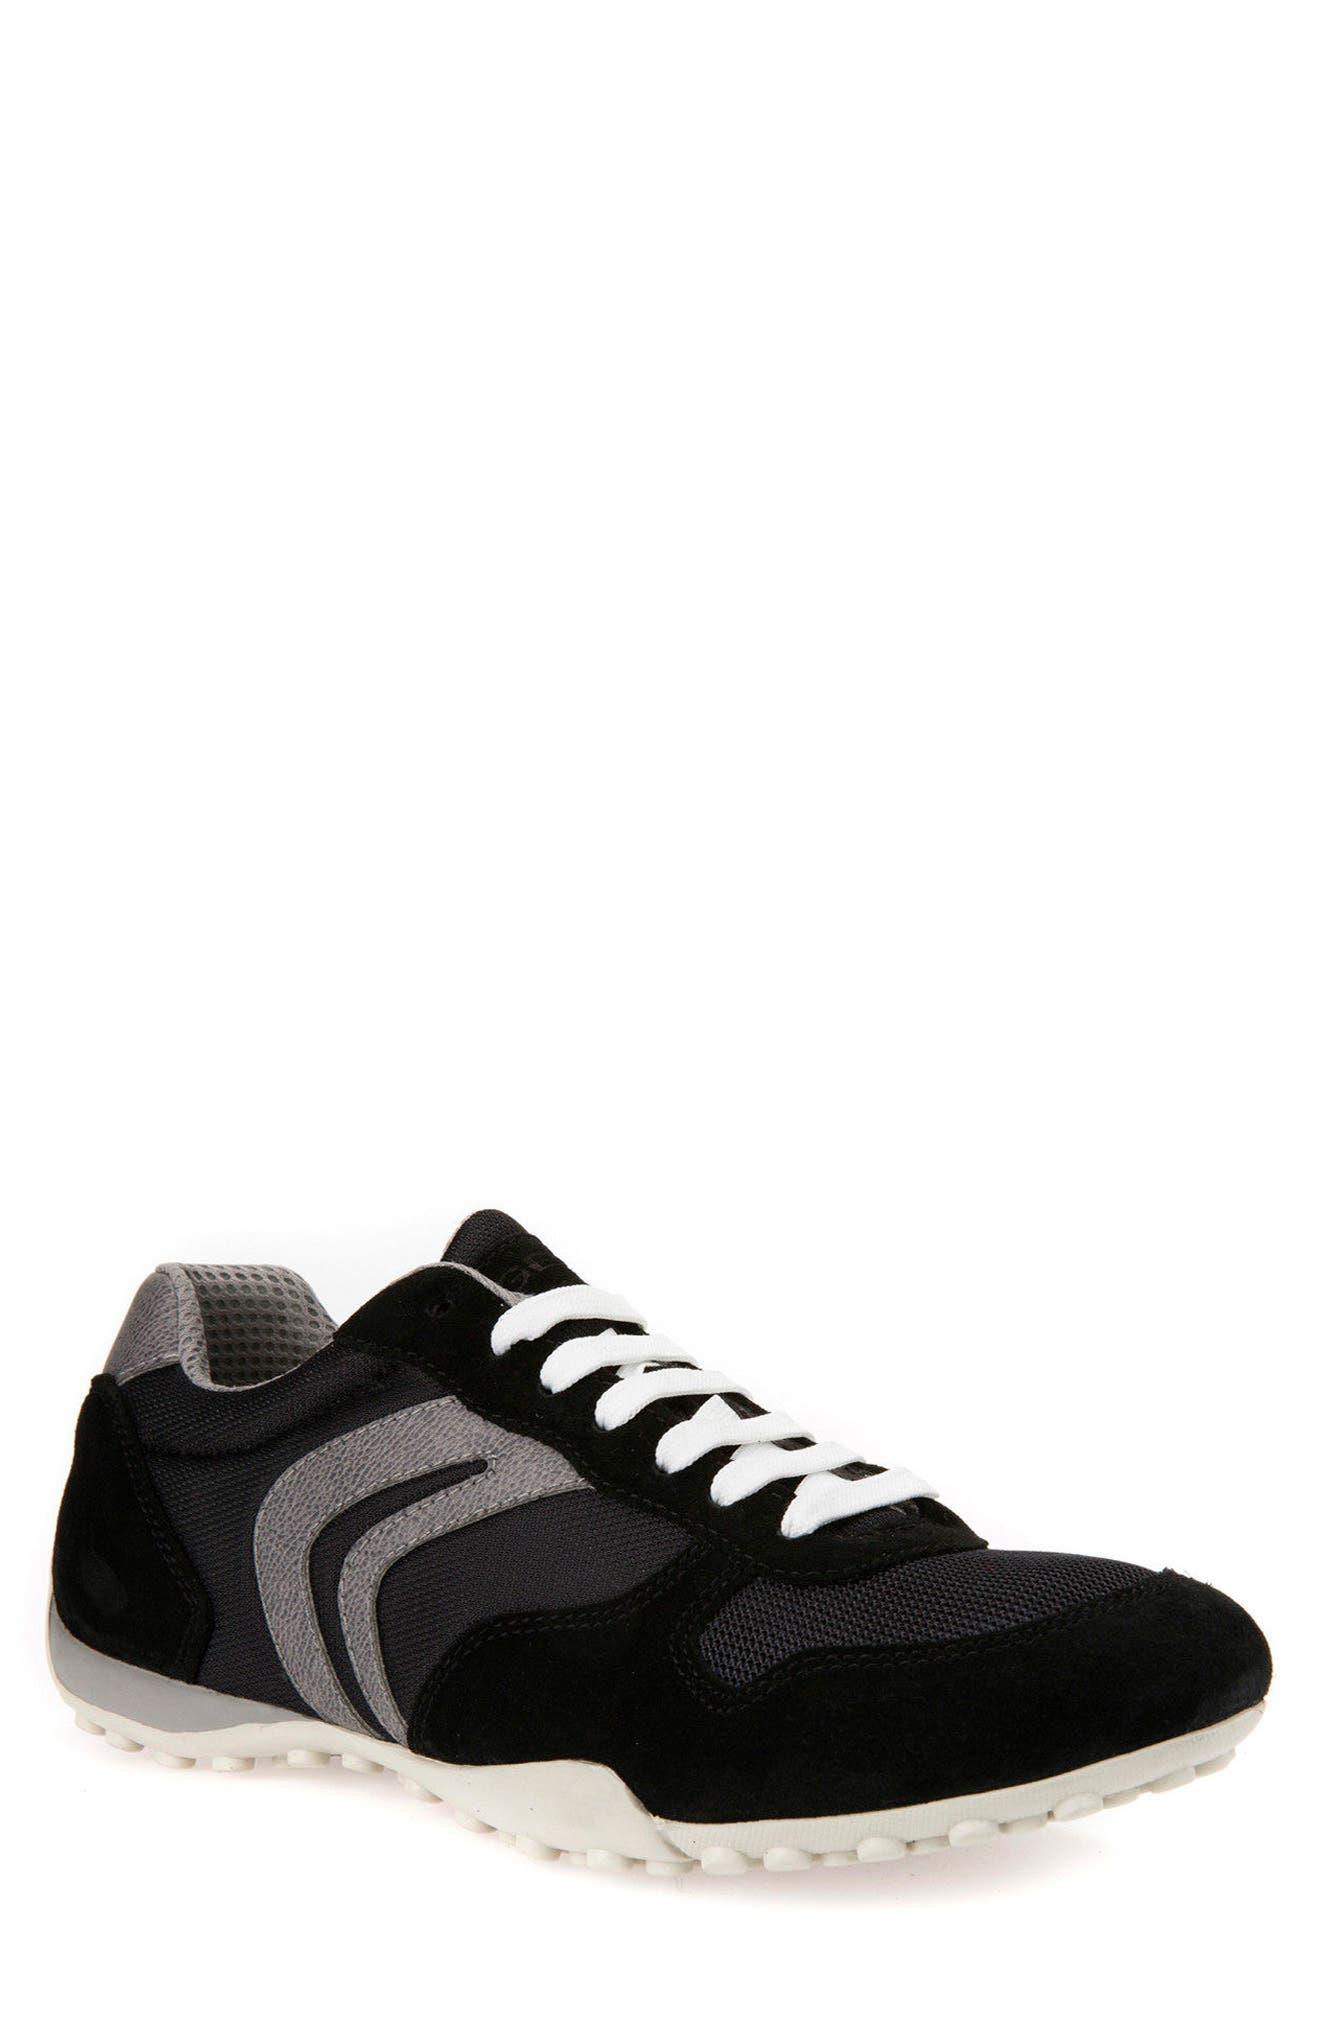 Geox Uomo Snake 118 Sneaker (Men)